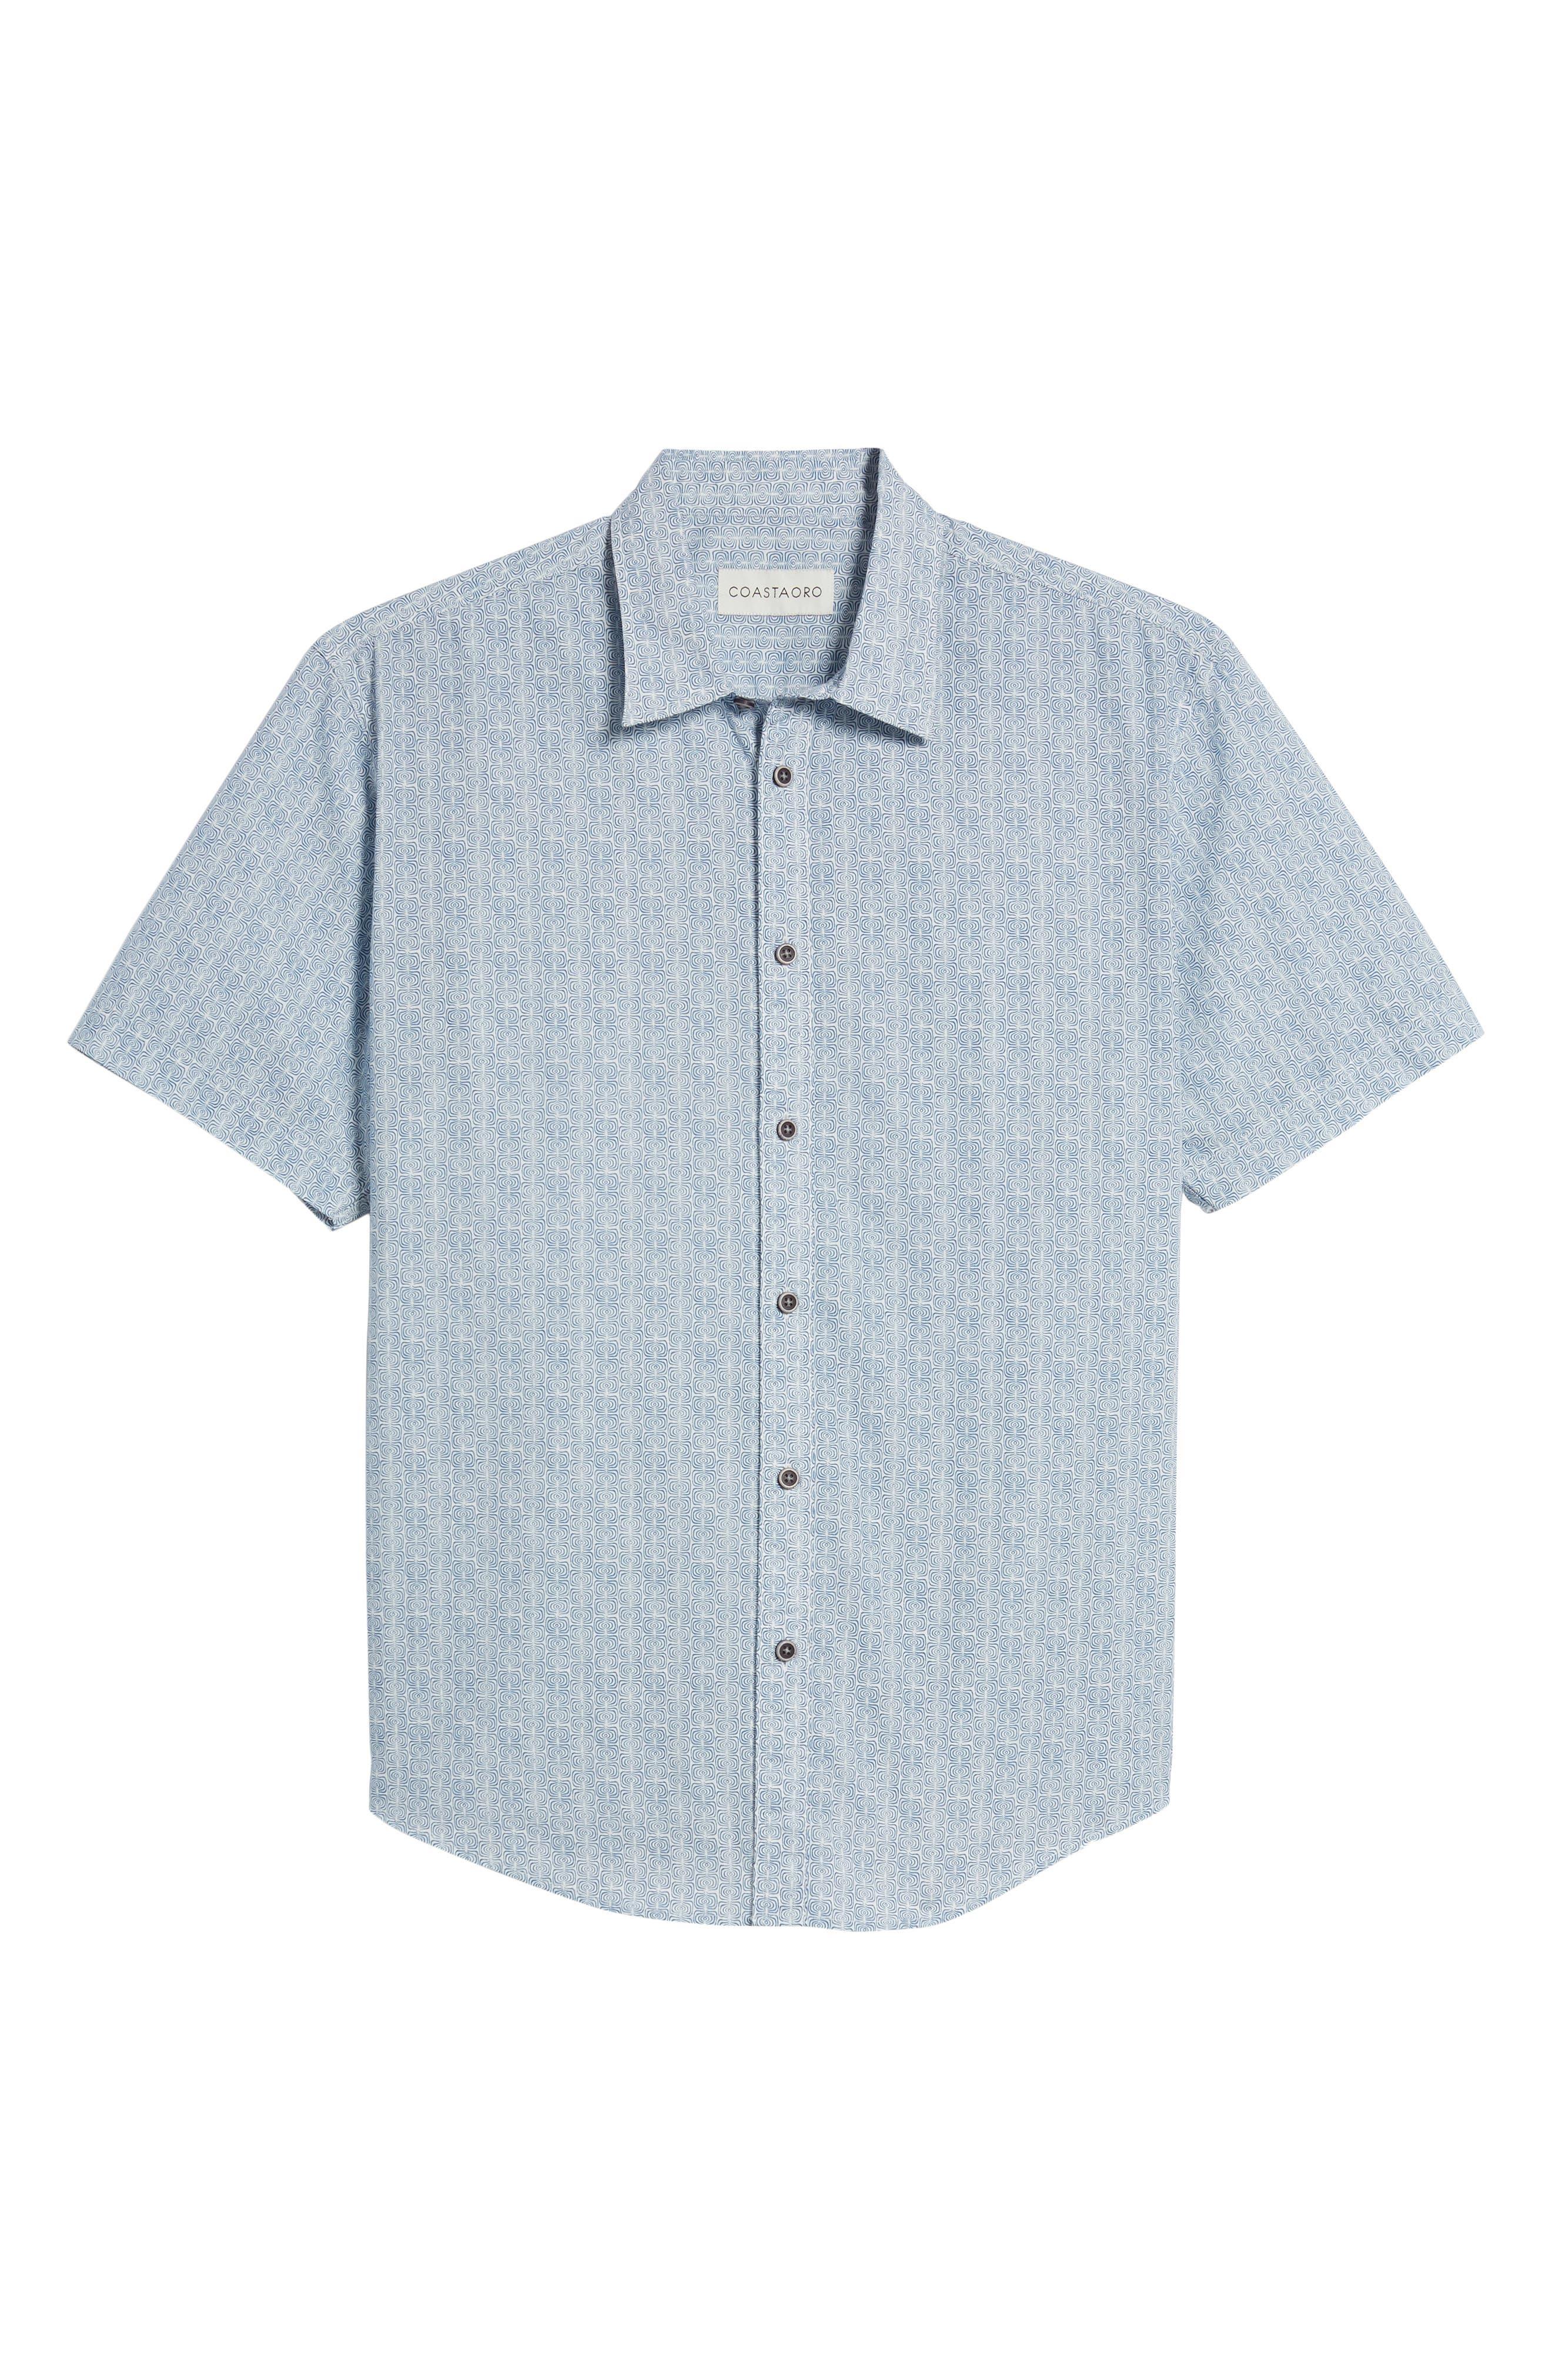 Jacurre Regular Fit Short Sleeve Sport Shirt,                             Alternate thumbnail 6, color,                             462